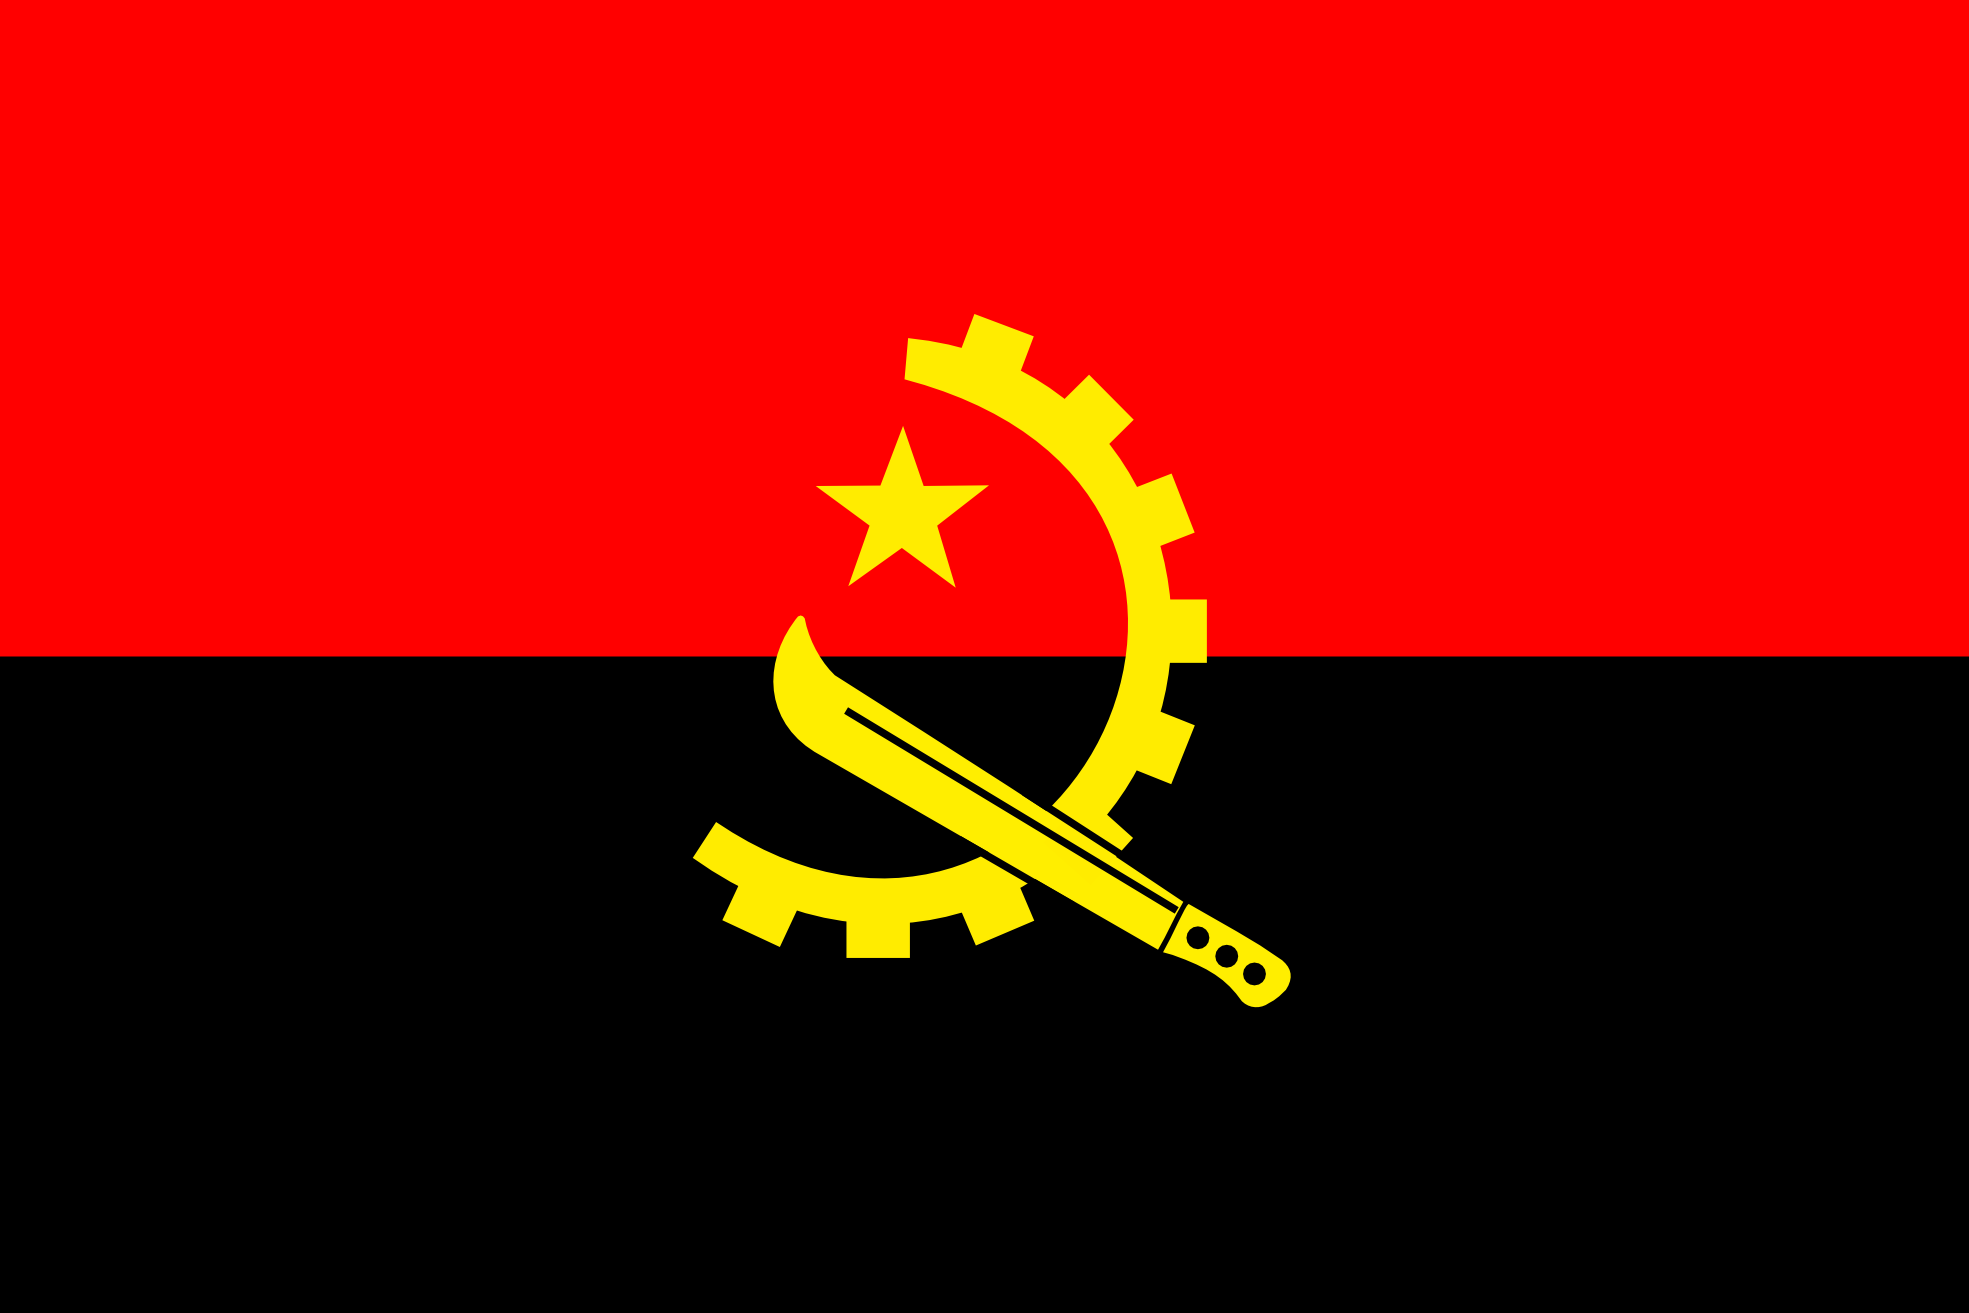 Travcour Visa & Legalisation Services Limited Angola Visa Application